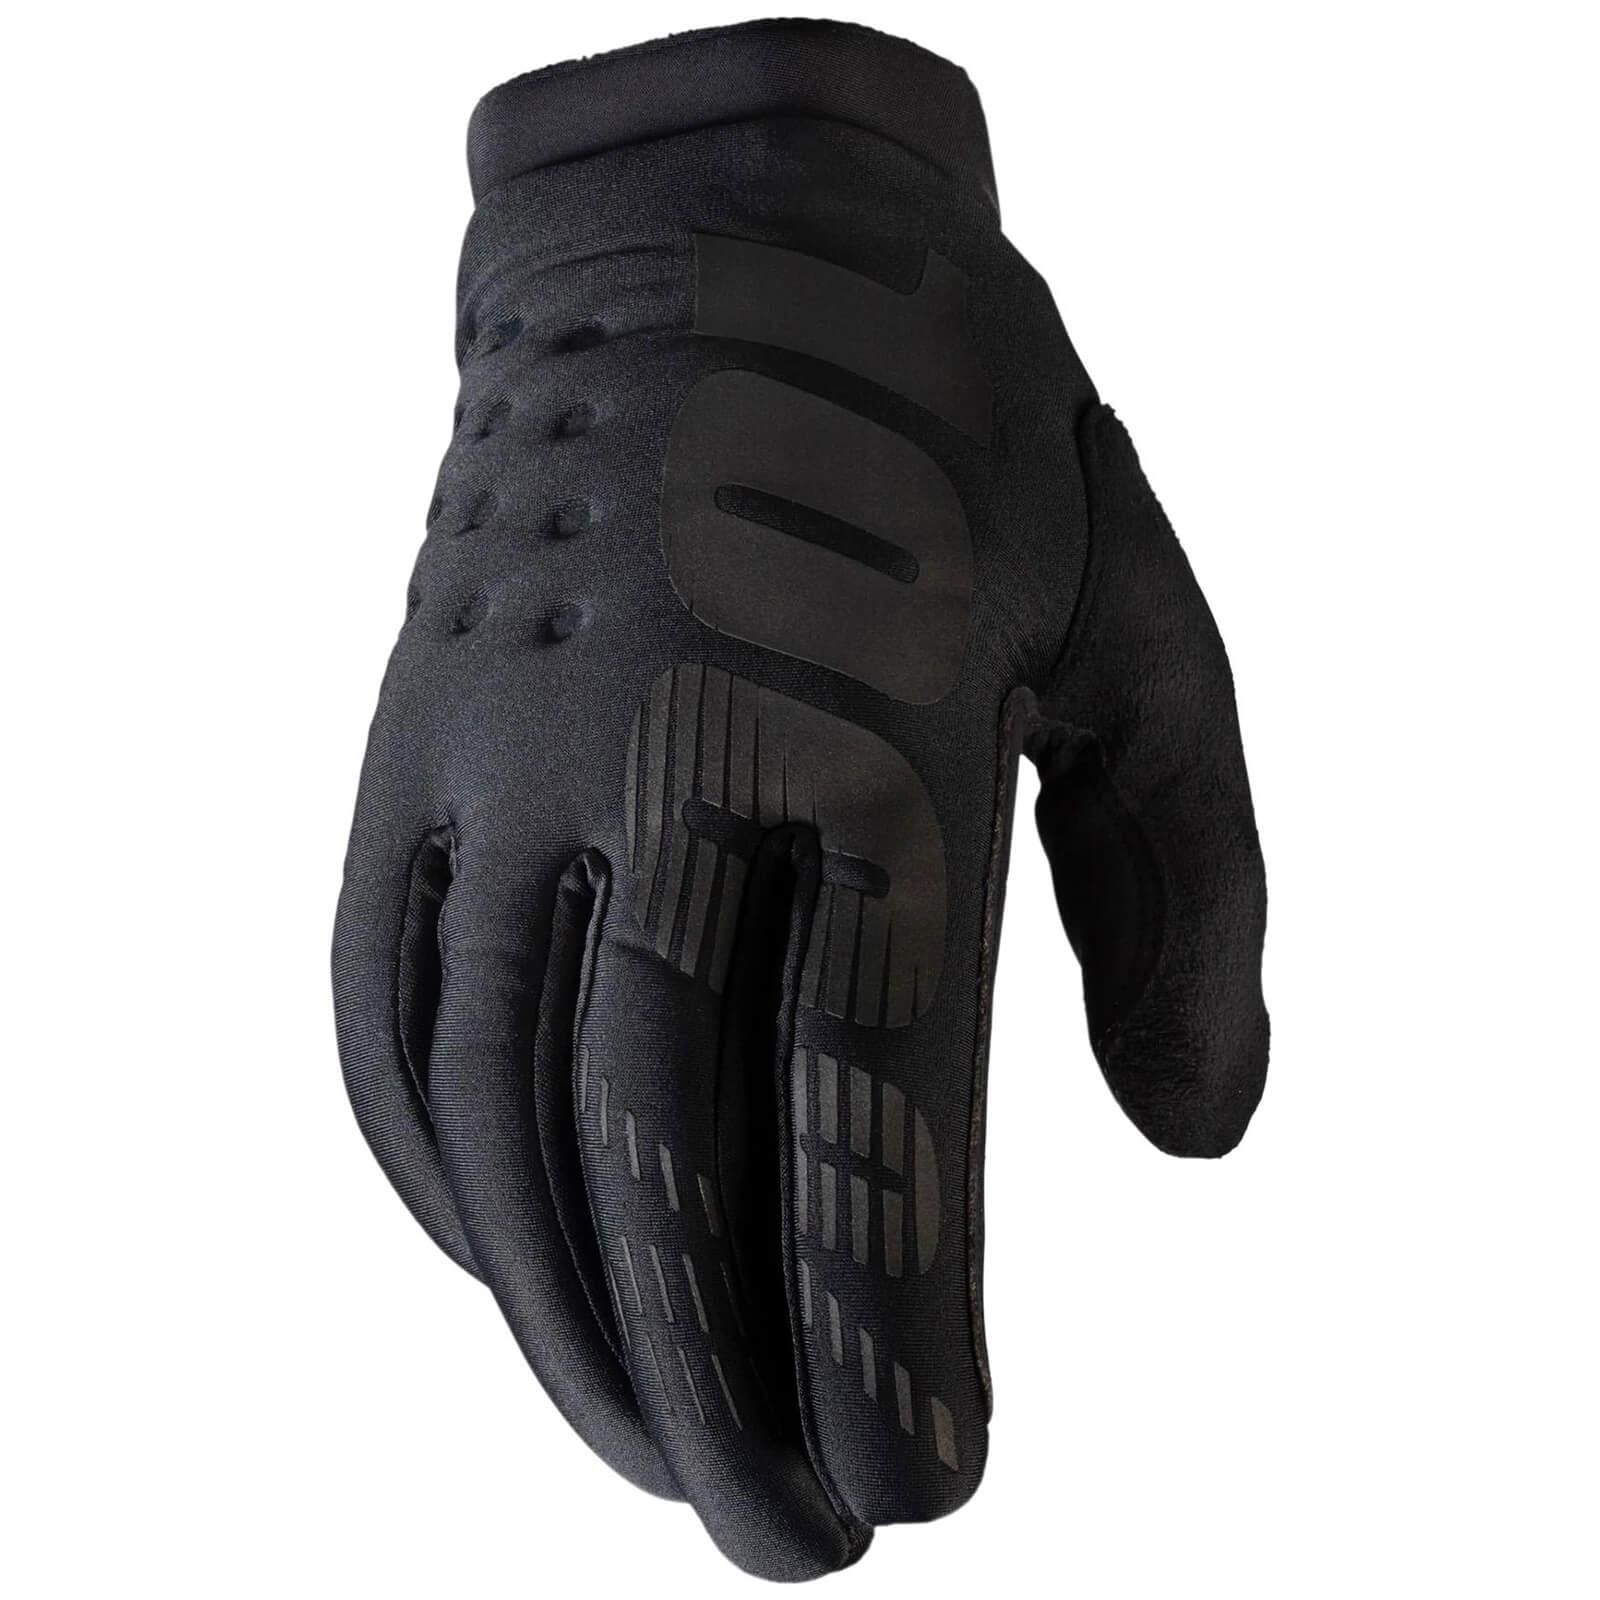 Image of 100% Brisker MTB Gloves - XL - Black/Grey